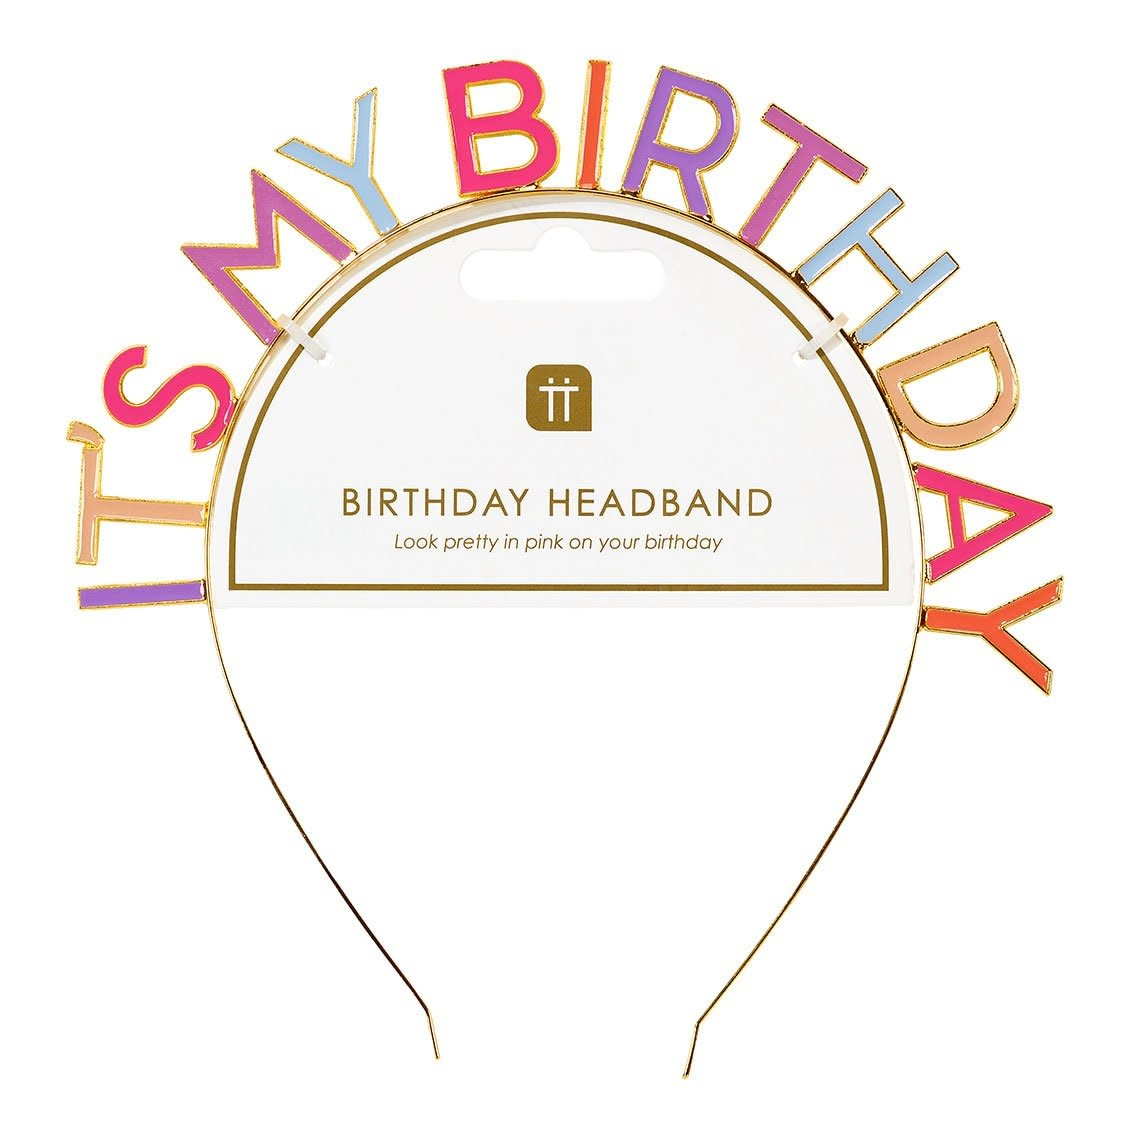 TT ROSE 'IT'S MY BIRTHDAY' ALLOY HEADBAND